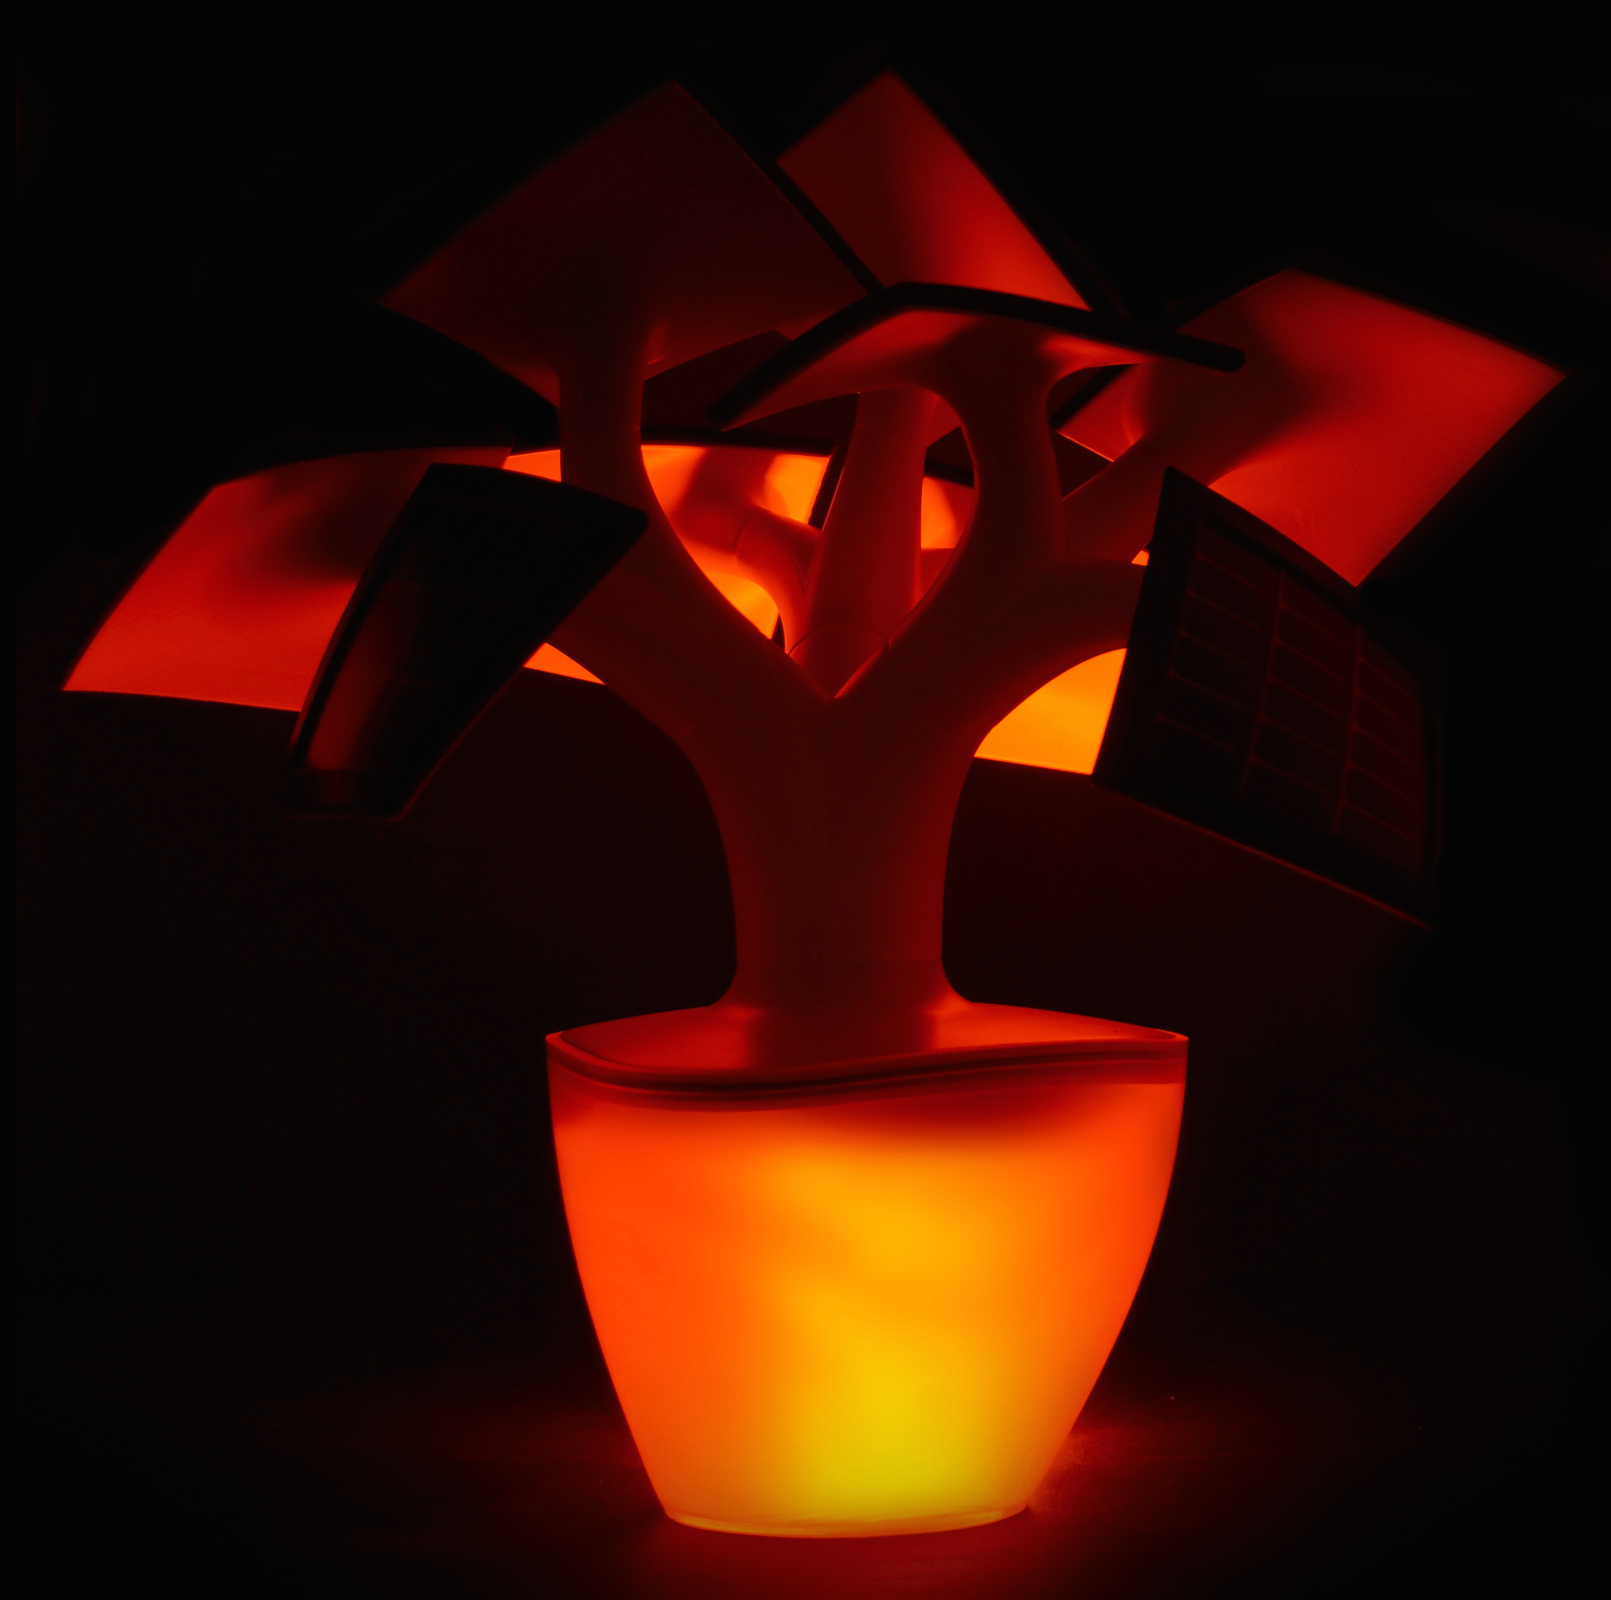 Turn your Electree into a lantern